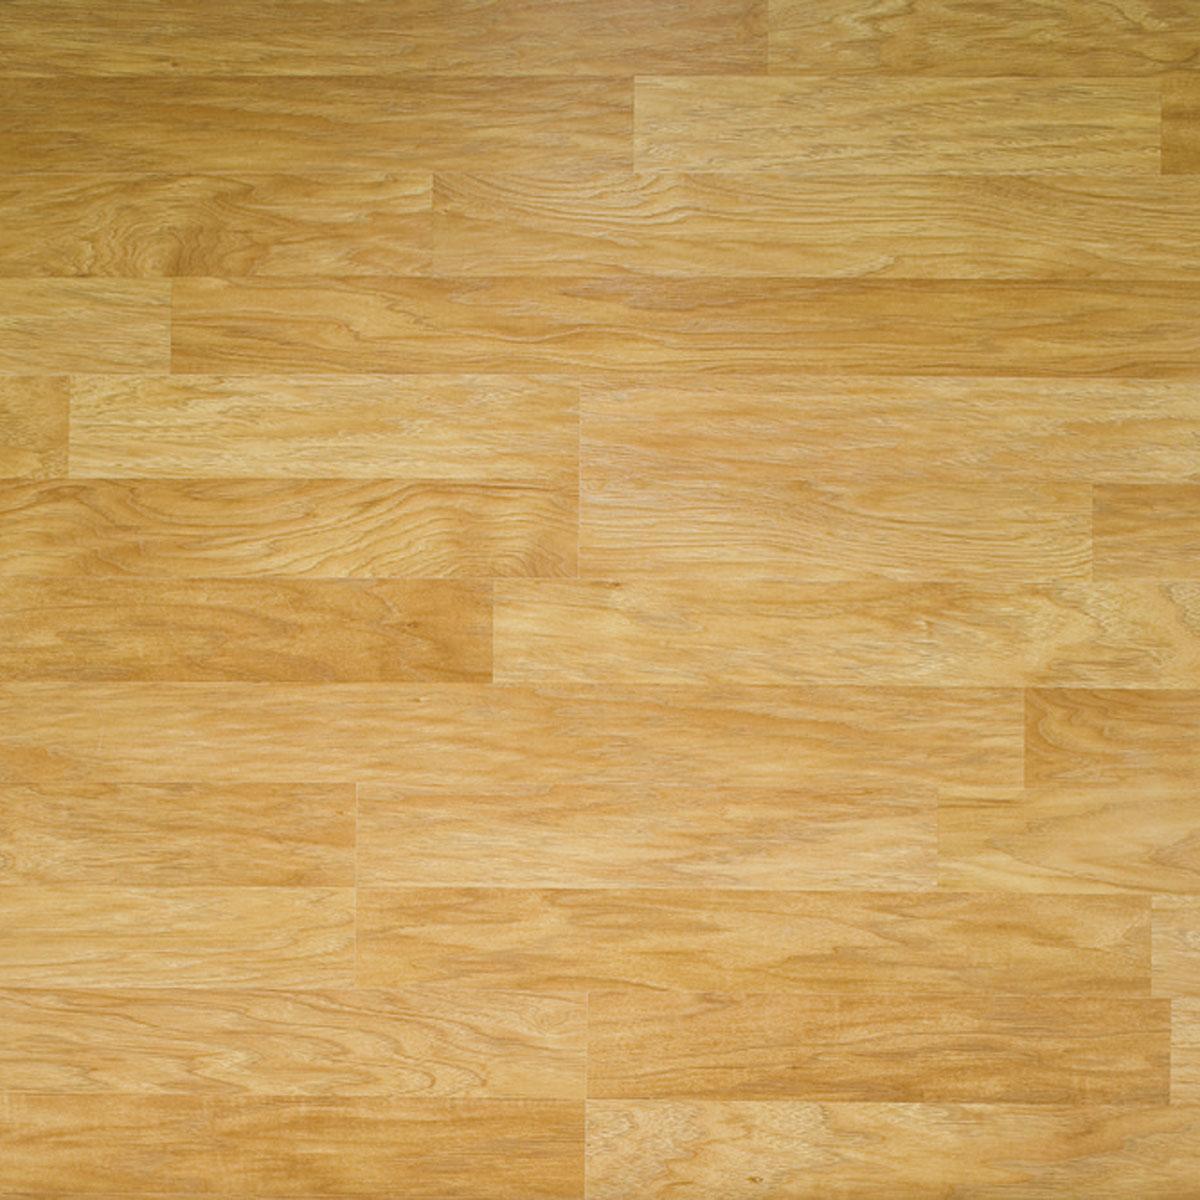 laminate flooring texture seamless seamless laminate texture LIFZCZH